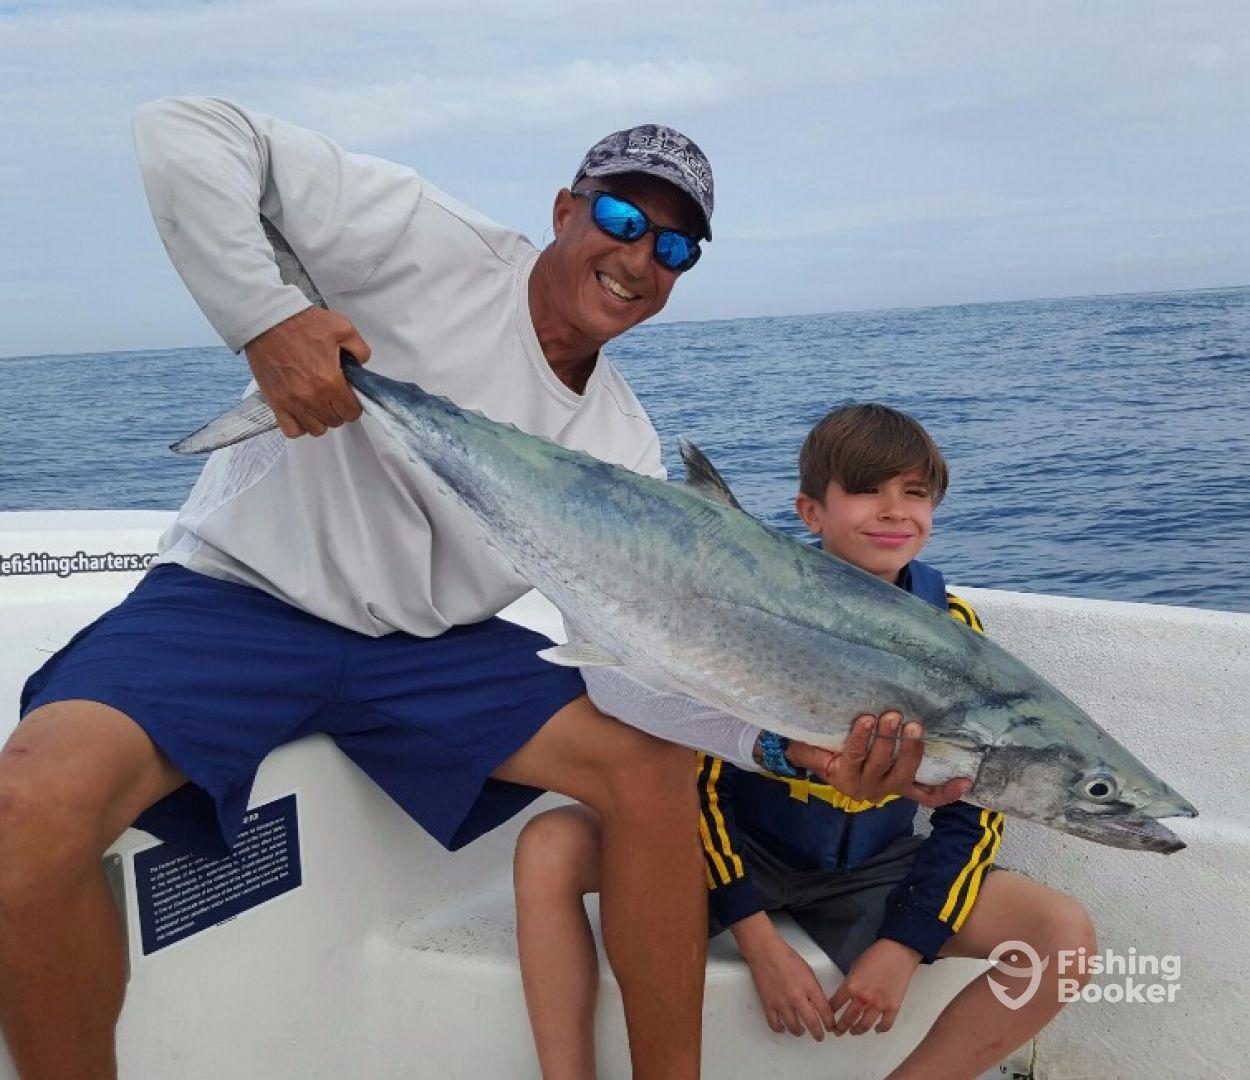 Bayside fishing charters san juan puerto rico for San juan fishing charters